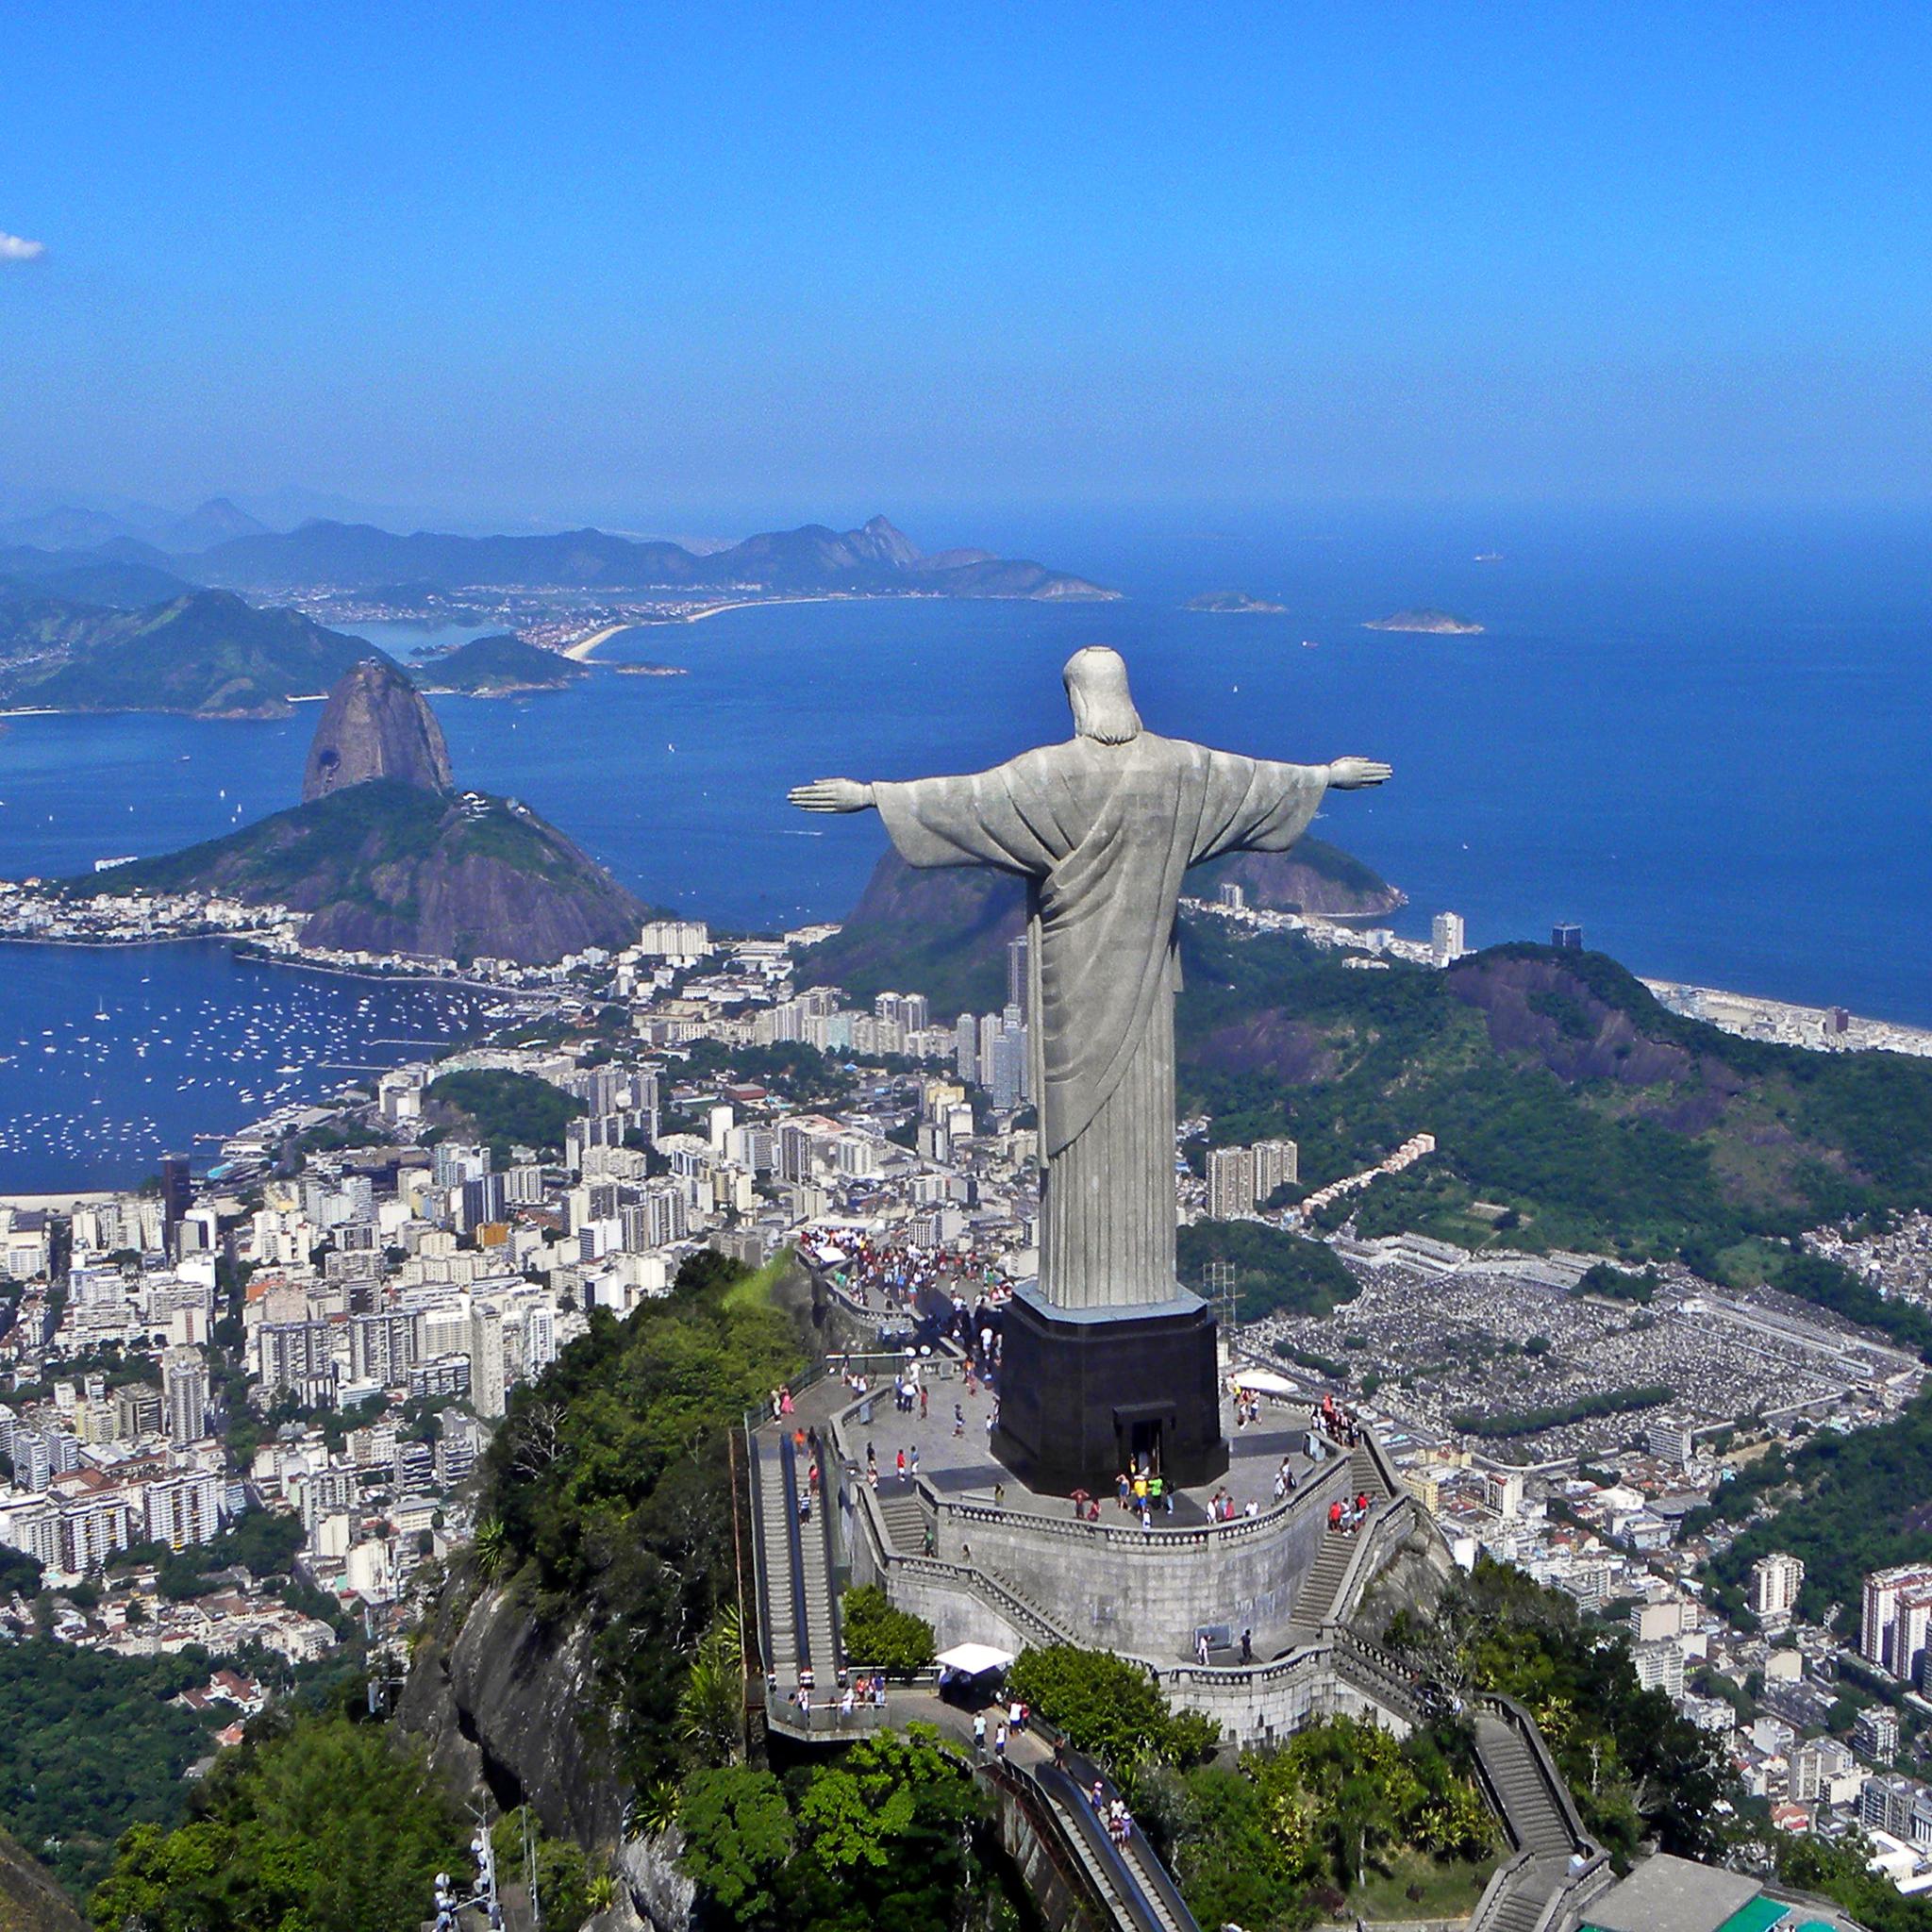 Christ on Corcovado mountain 3Wallpapers ipad Retina Christ on Corcovado Mountain   iPad Retina